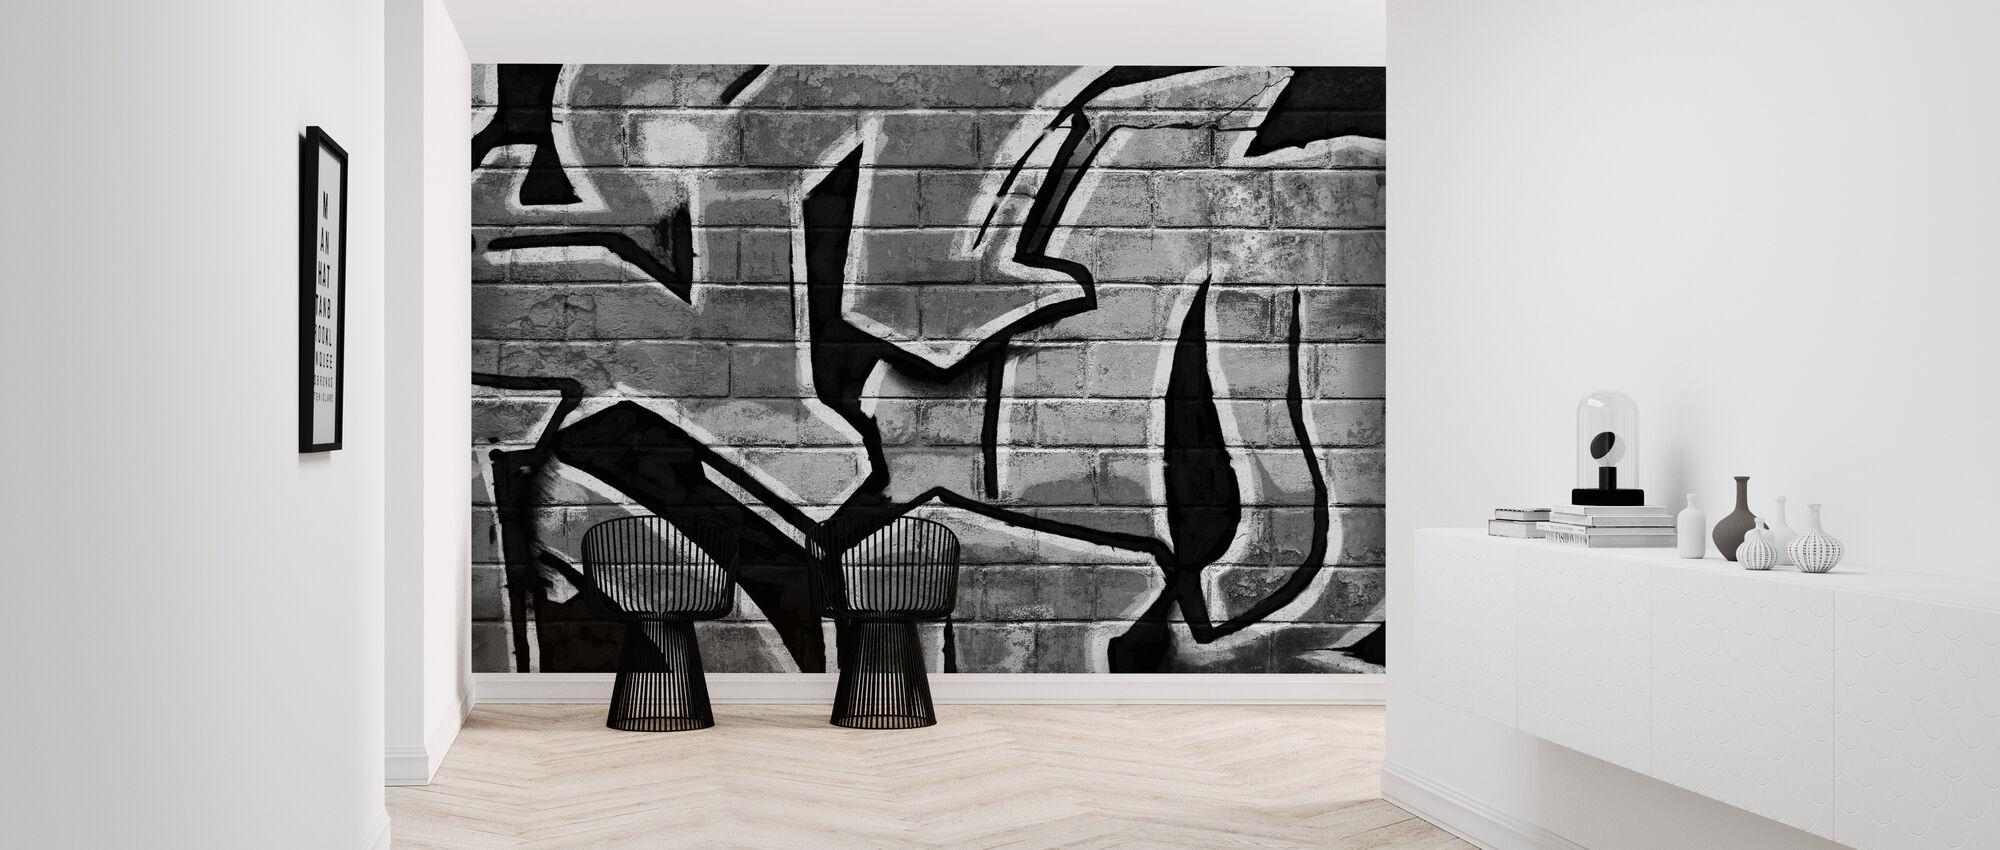 Graffiti murvegg - Bw - Tapet - Gang